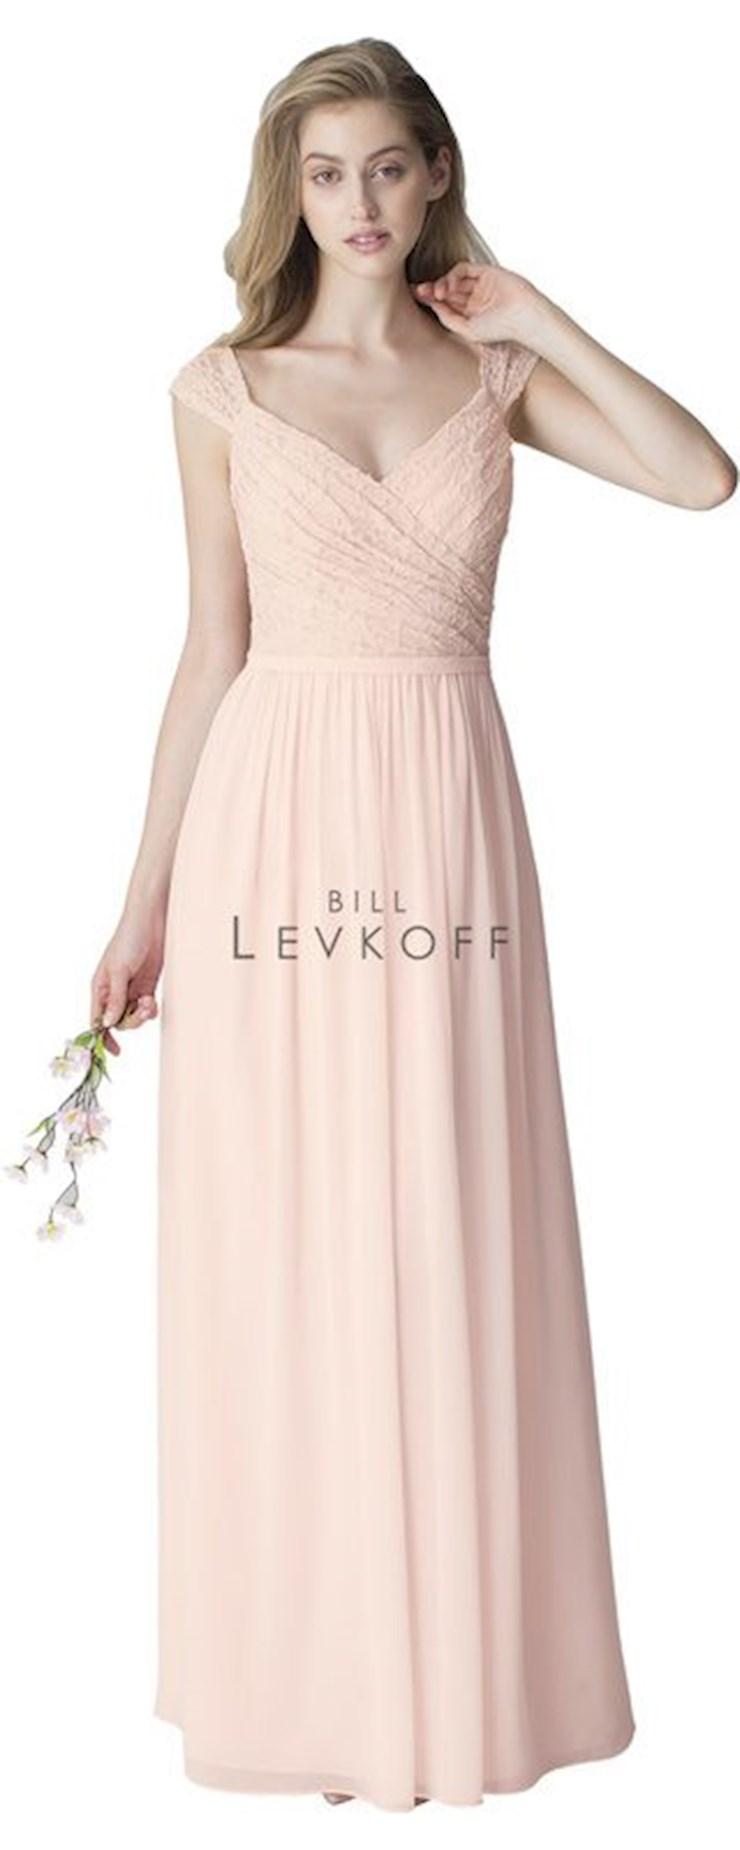 Bill Levkoff Style 1250